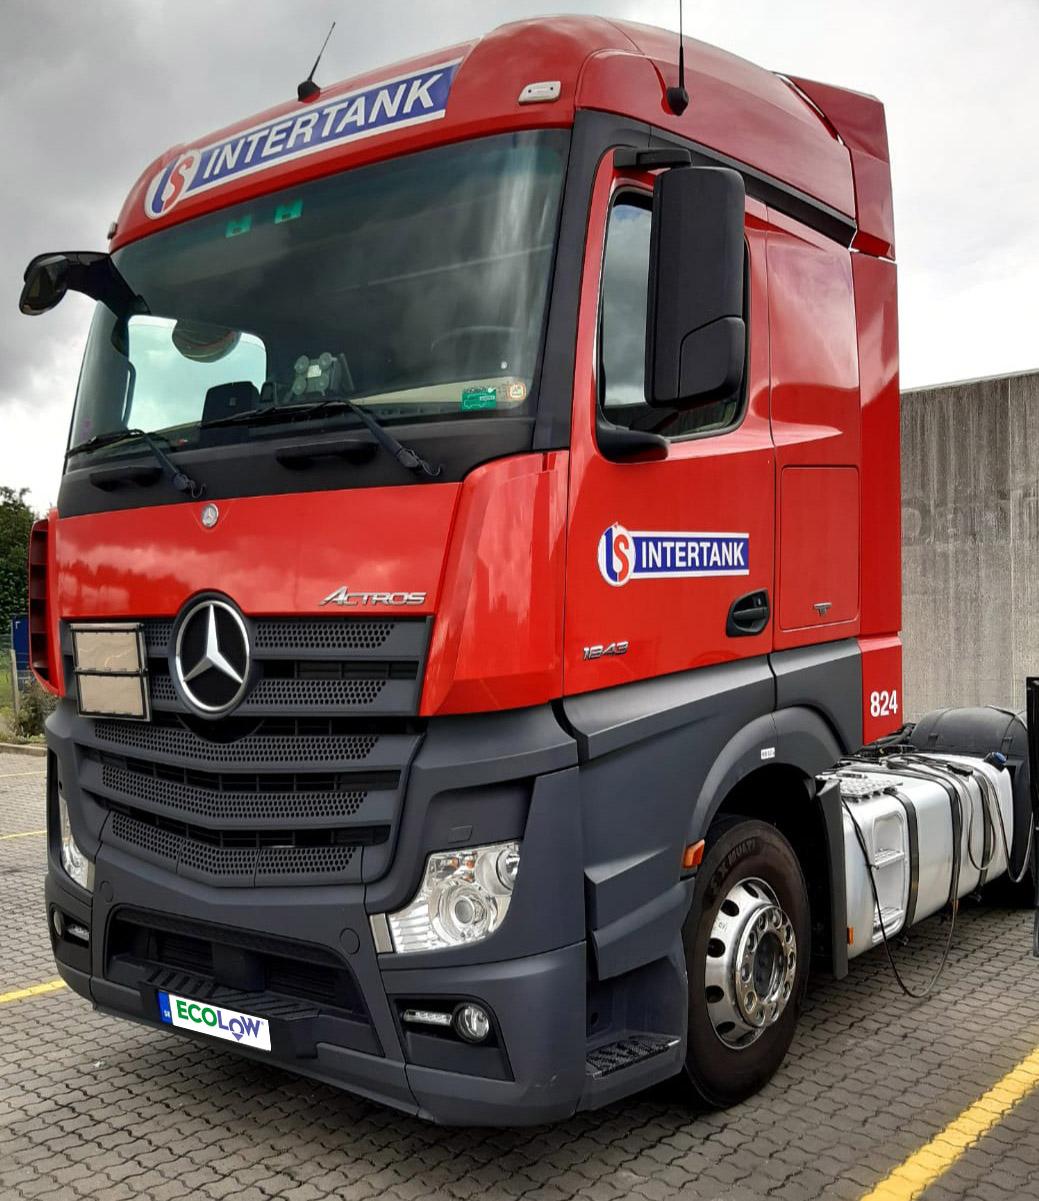 Transports INTERTANK (DK)